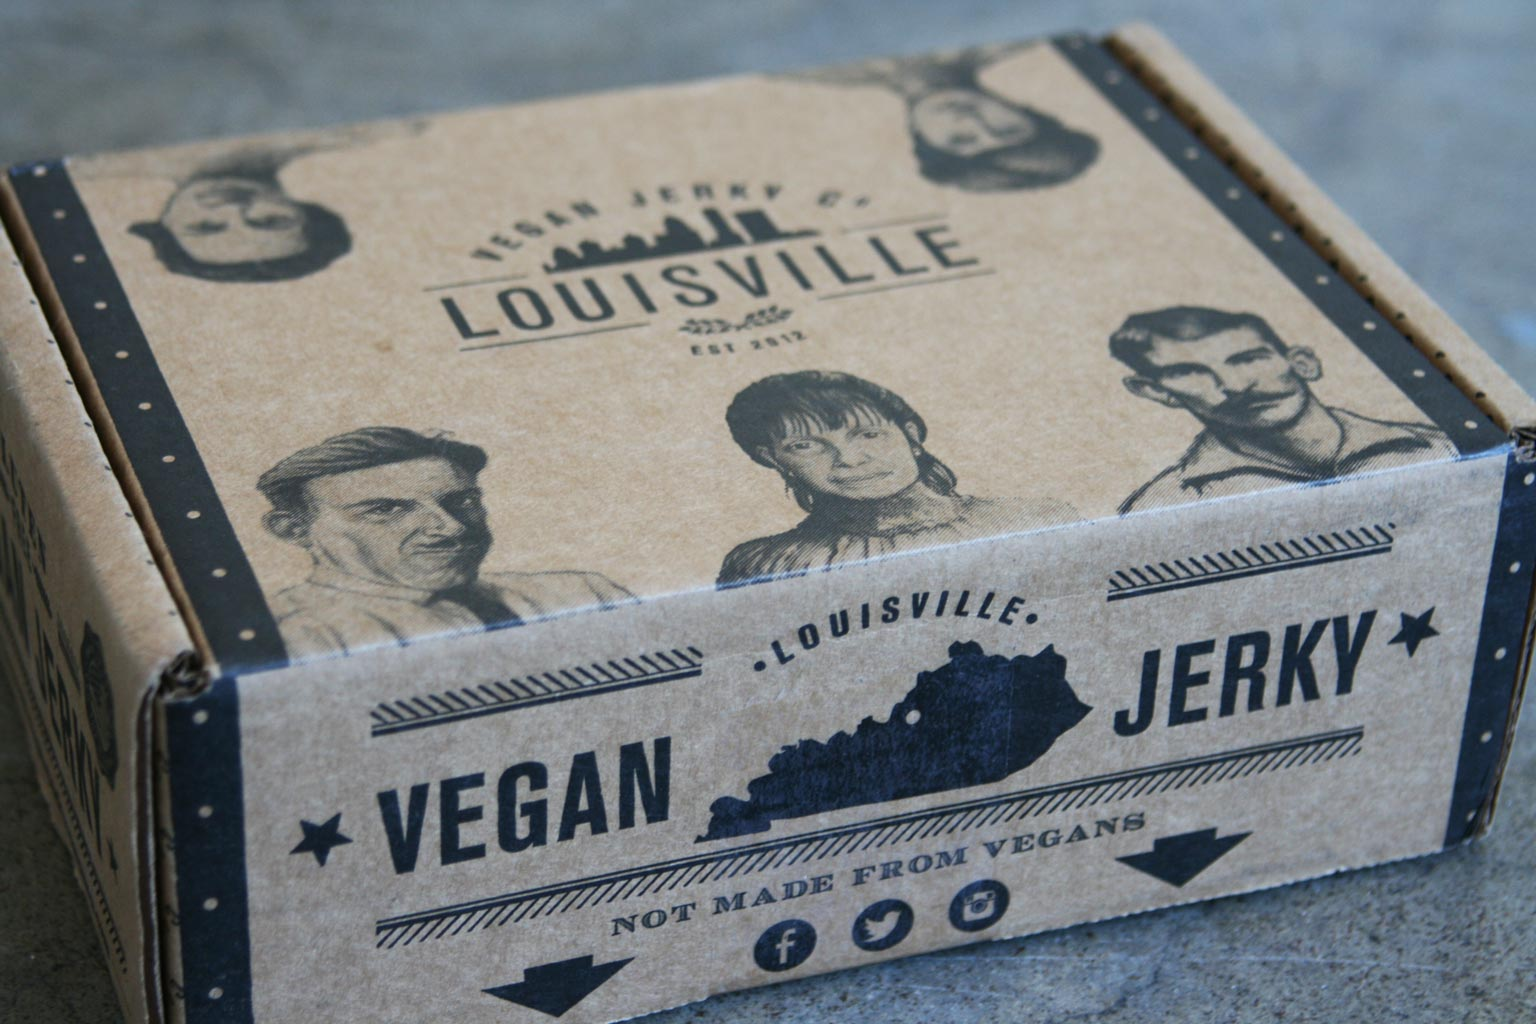 louisville-vegan-jerky_1444